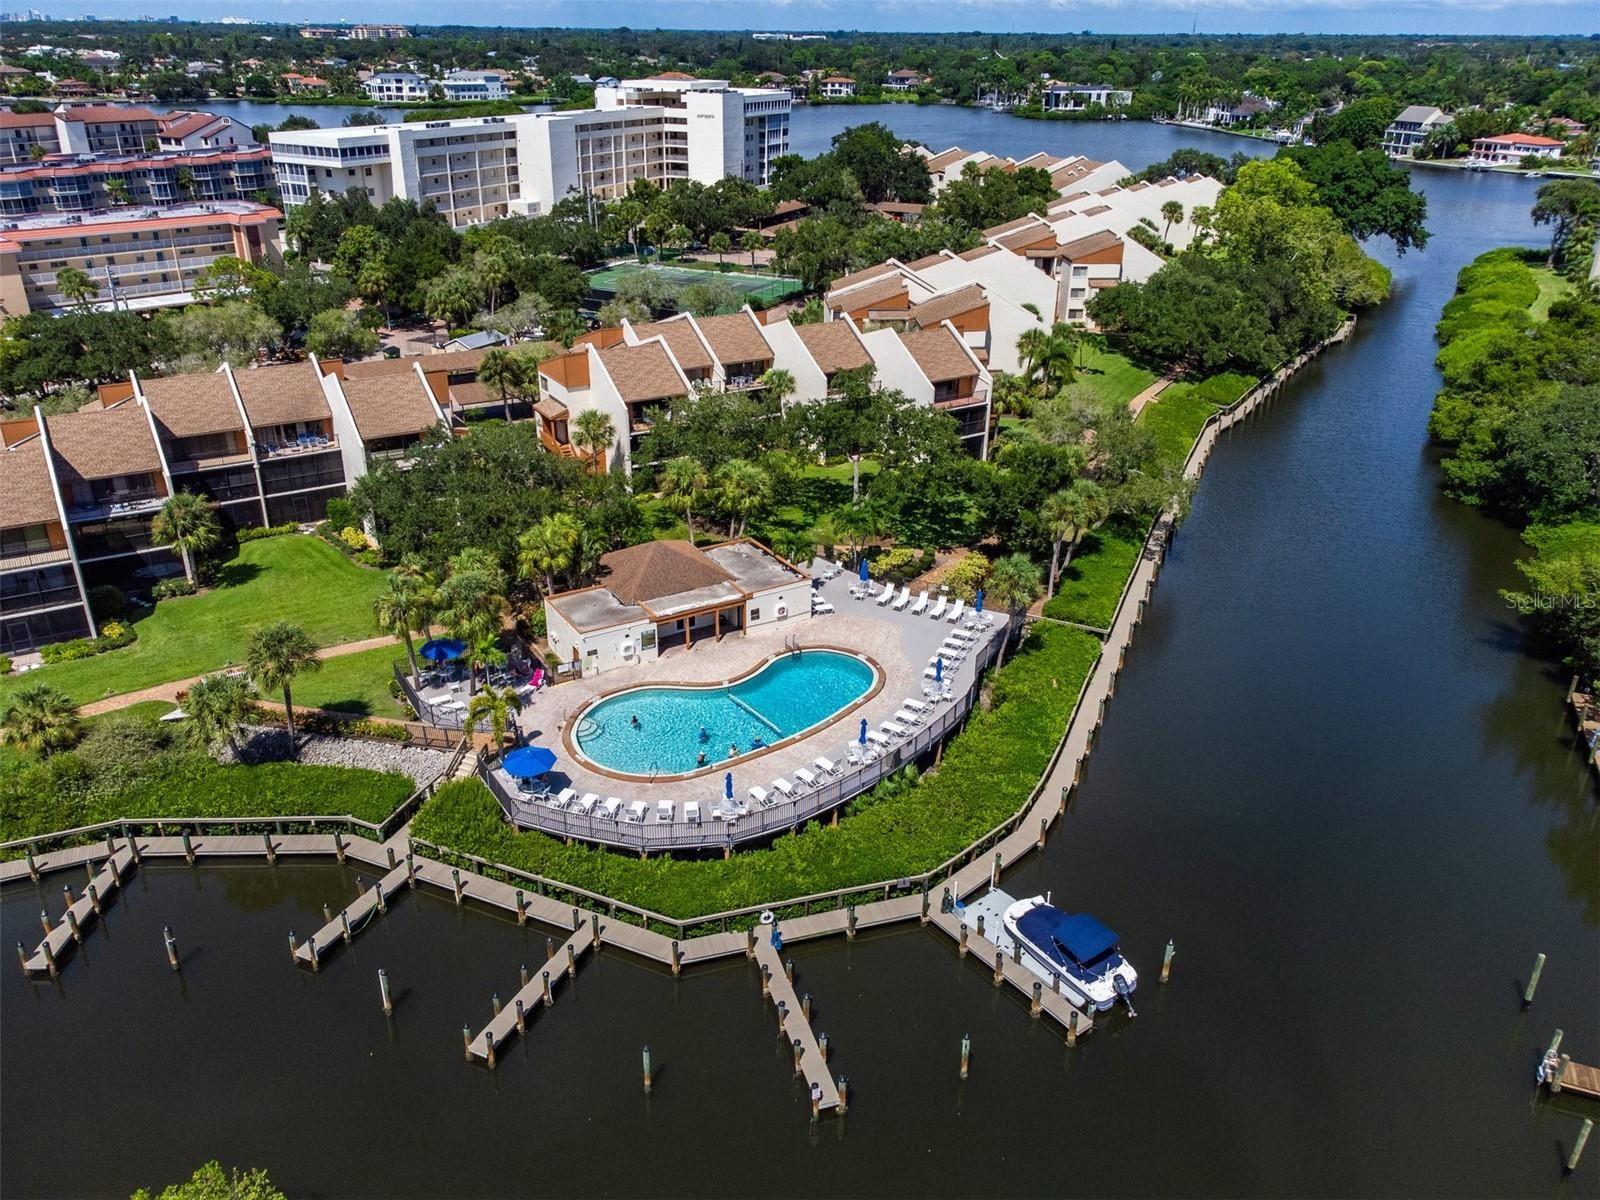 1600 COVE II PLACE #413, Sarasota, FL 34242 - #: A4512400